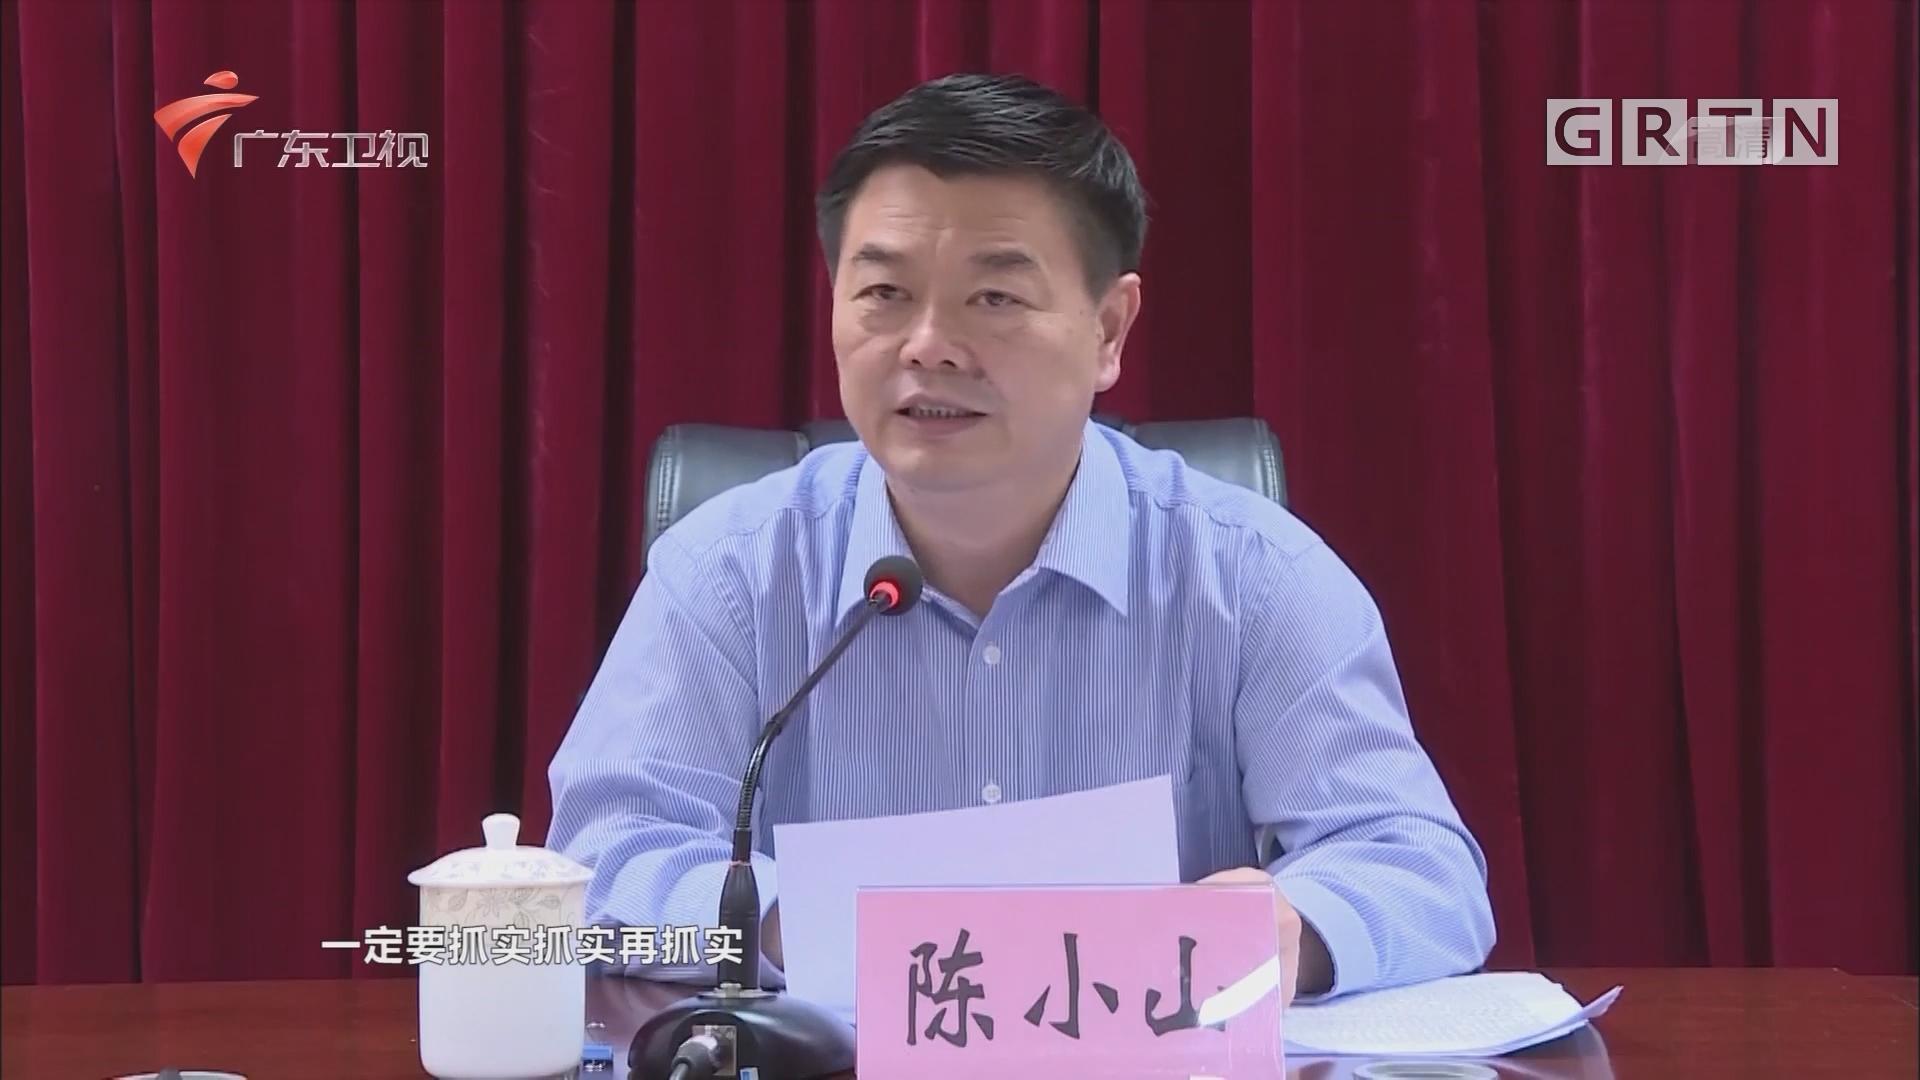 [HD][2018-08-04]广东视窗:阳江:打造新时代街镇党校 服务乡村振兴发展